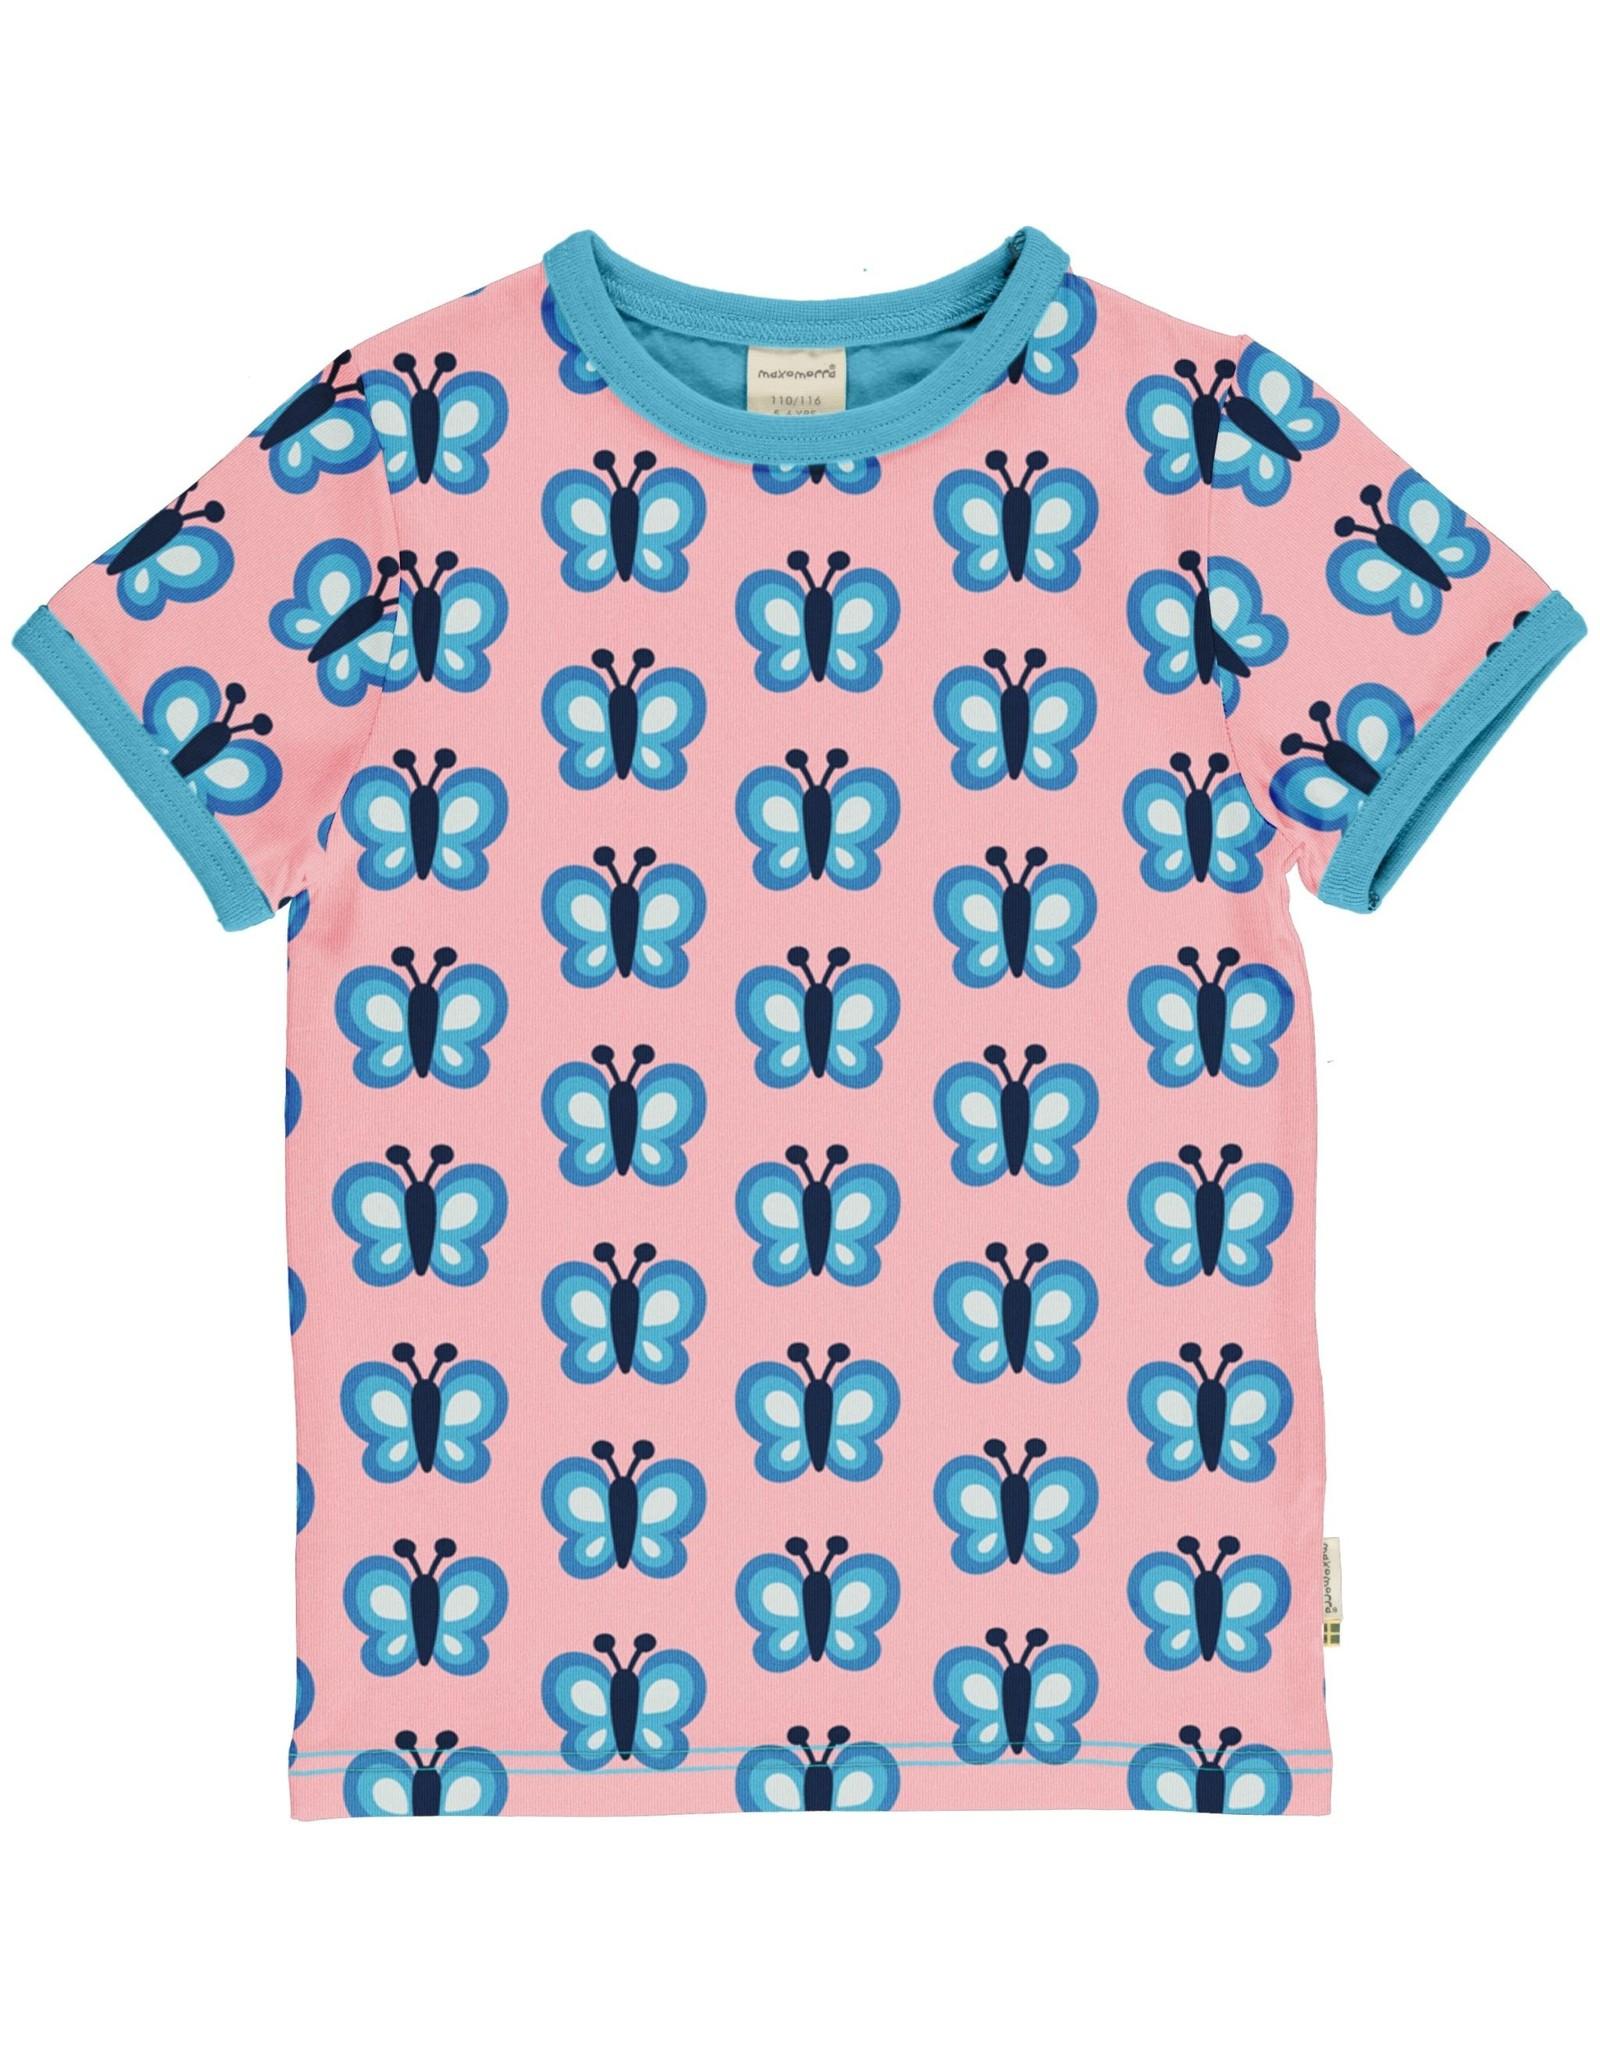 Maxomorra Maxomorra t-shirt met vlinder print